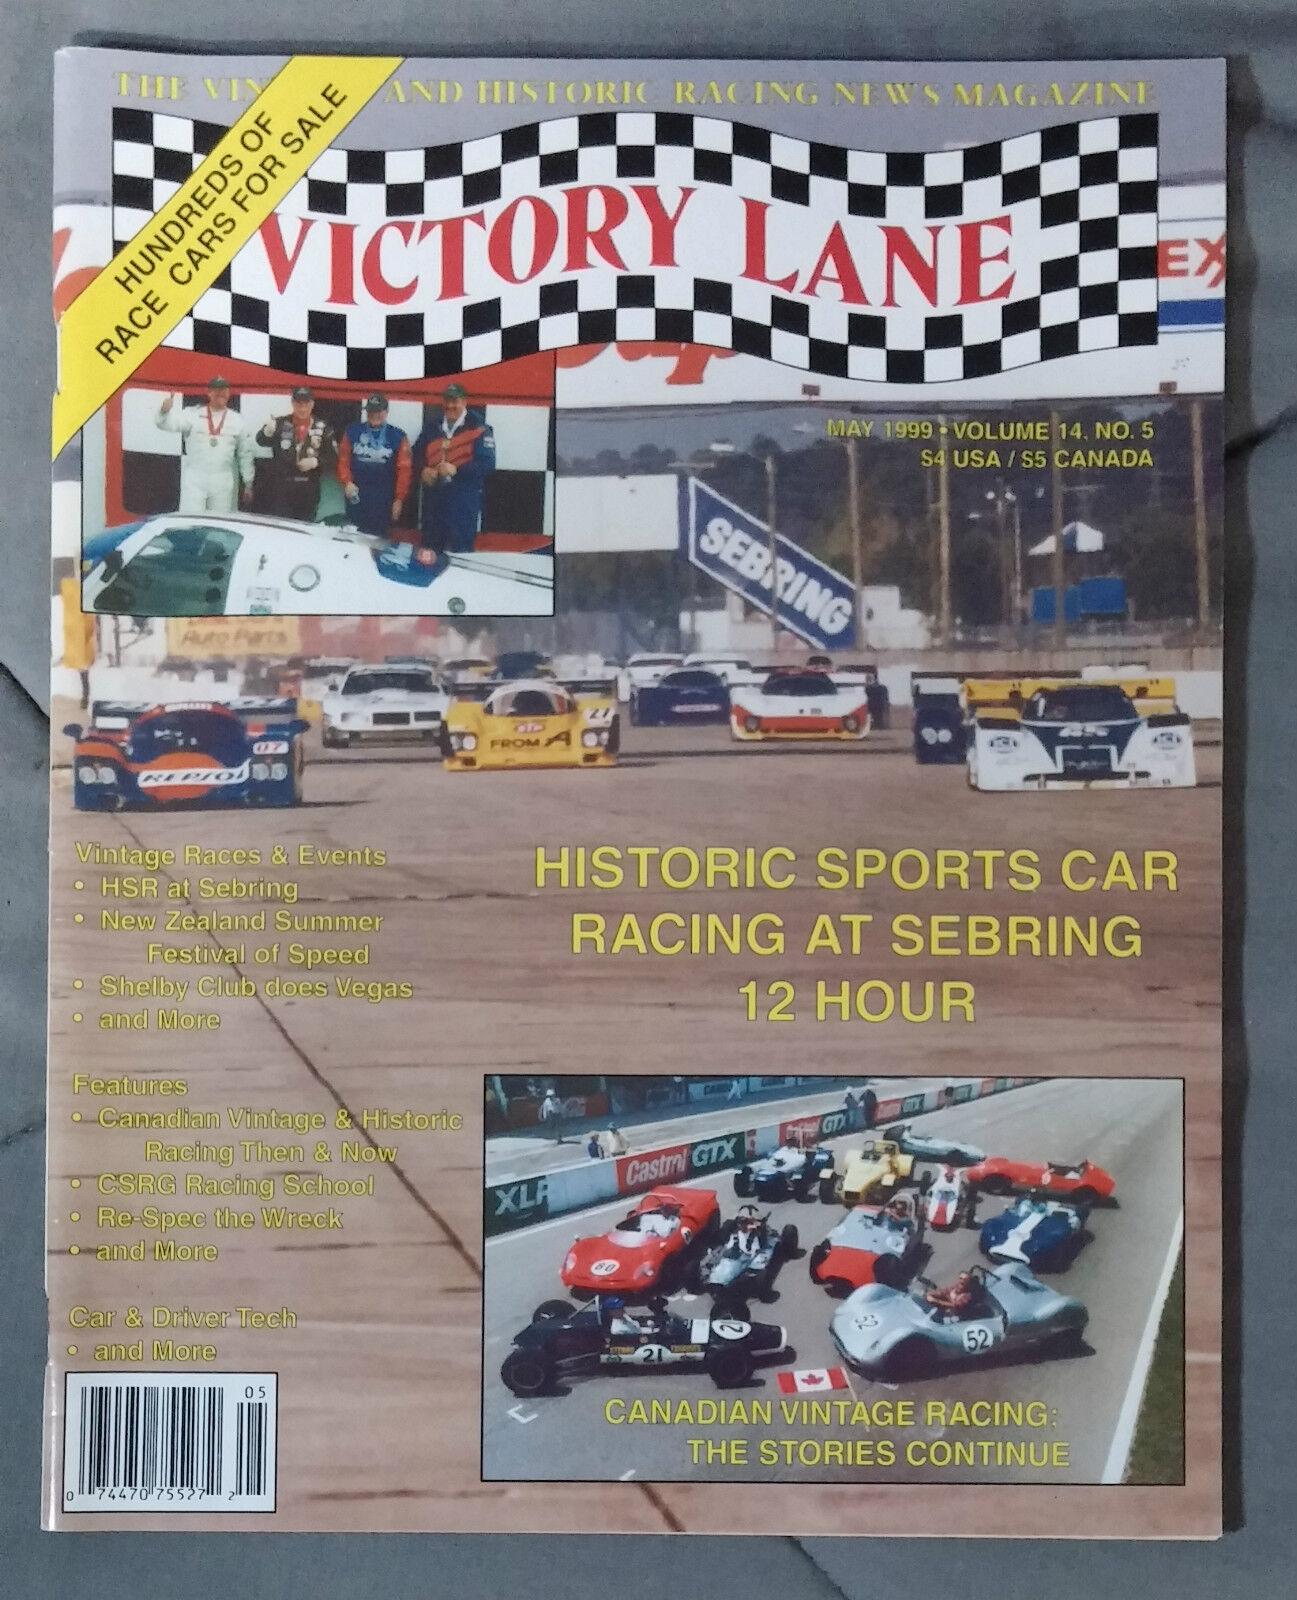 VICTORY LANE HISTORIC RACING NEWS VINTAGE MAGAZINE 1999 MAY SEBRING ...